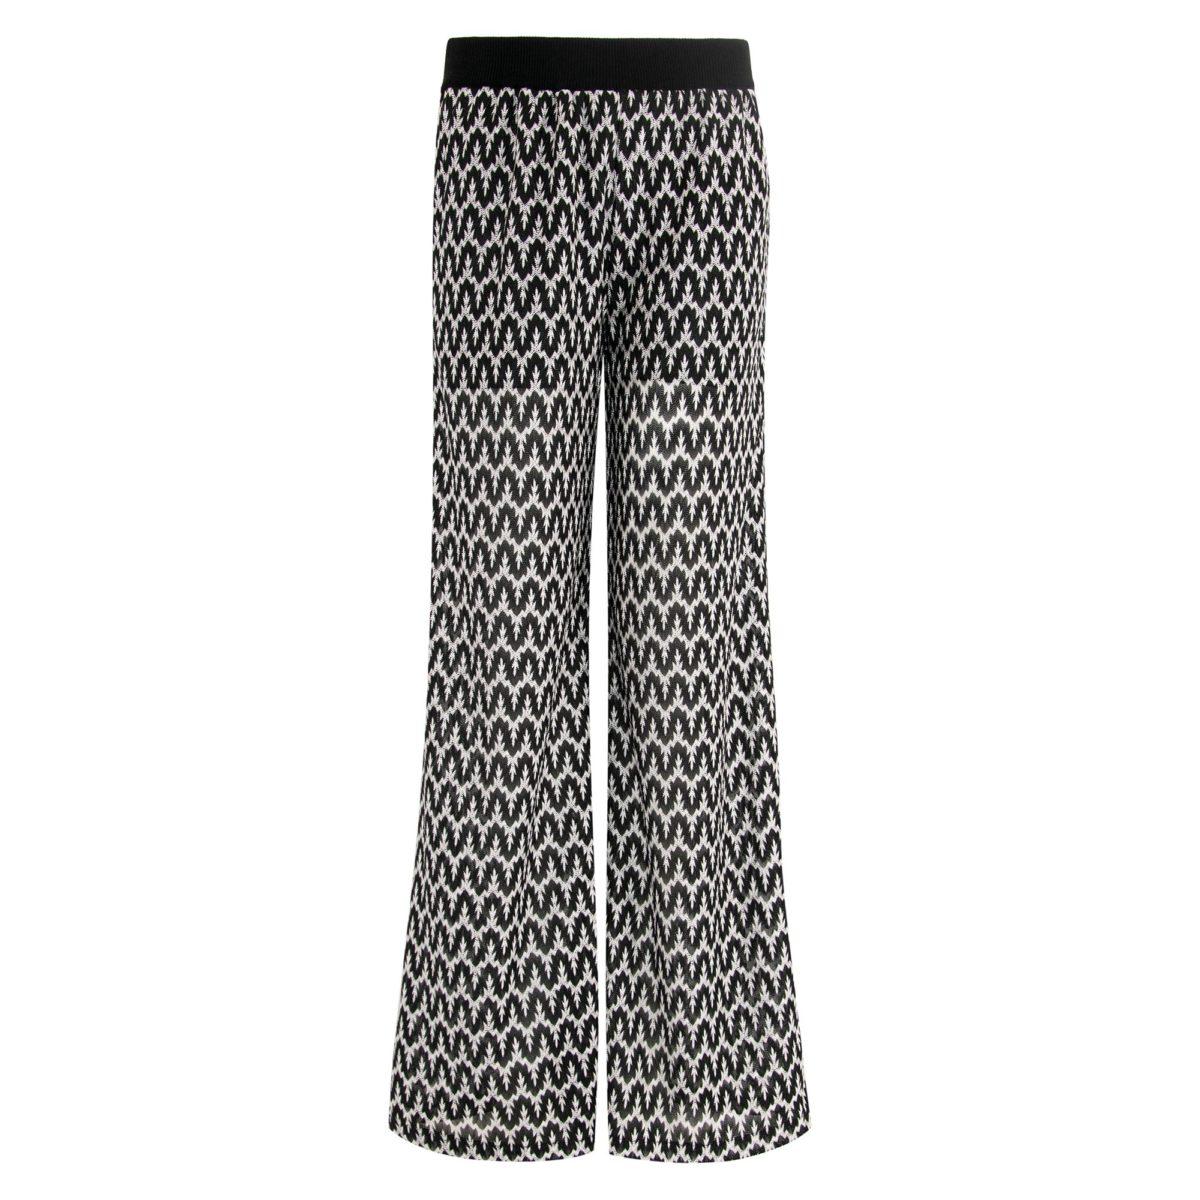 Pantalone Wide leg a maglia raschel